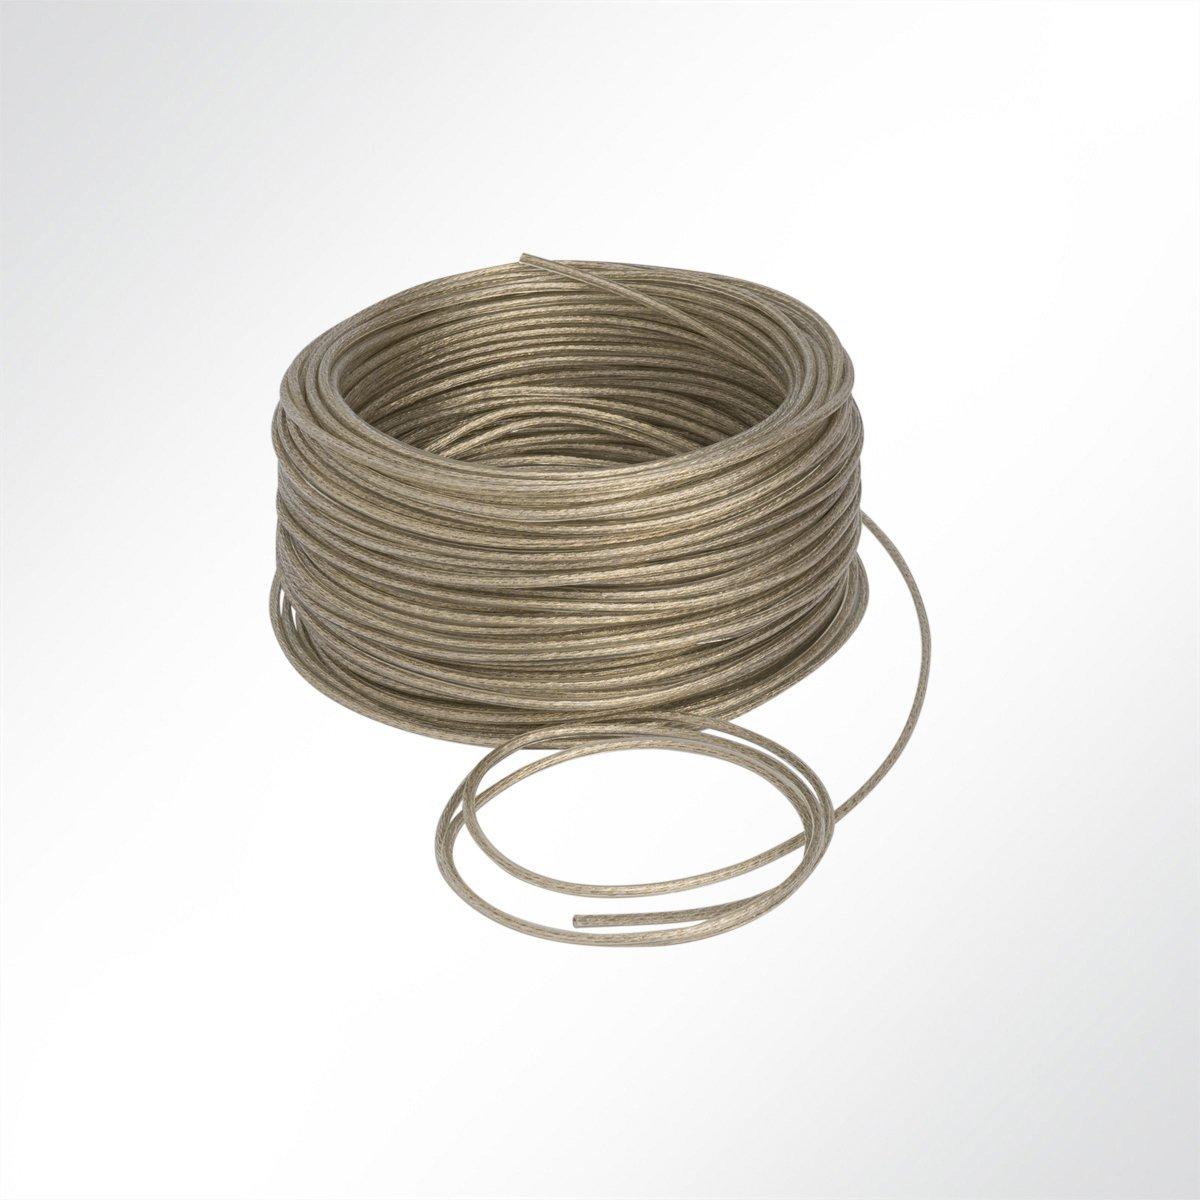 6mm in Grau 1 m D LYSEL Zollseil mit Edelstahleinlage und PVC Ma,